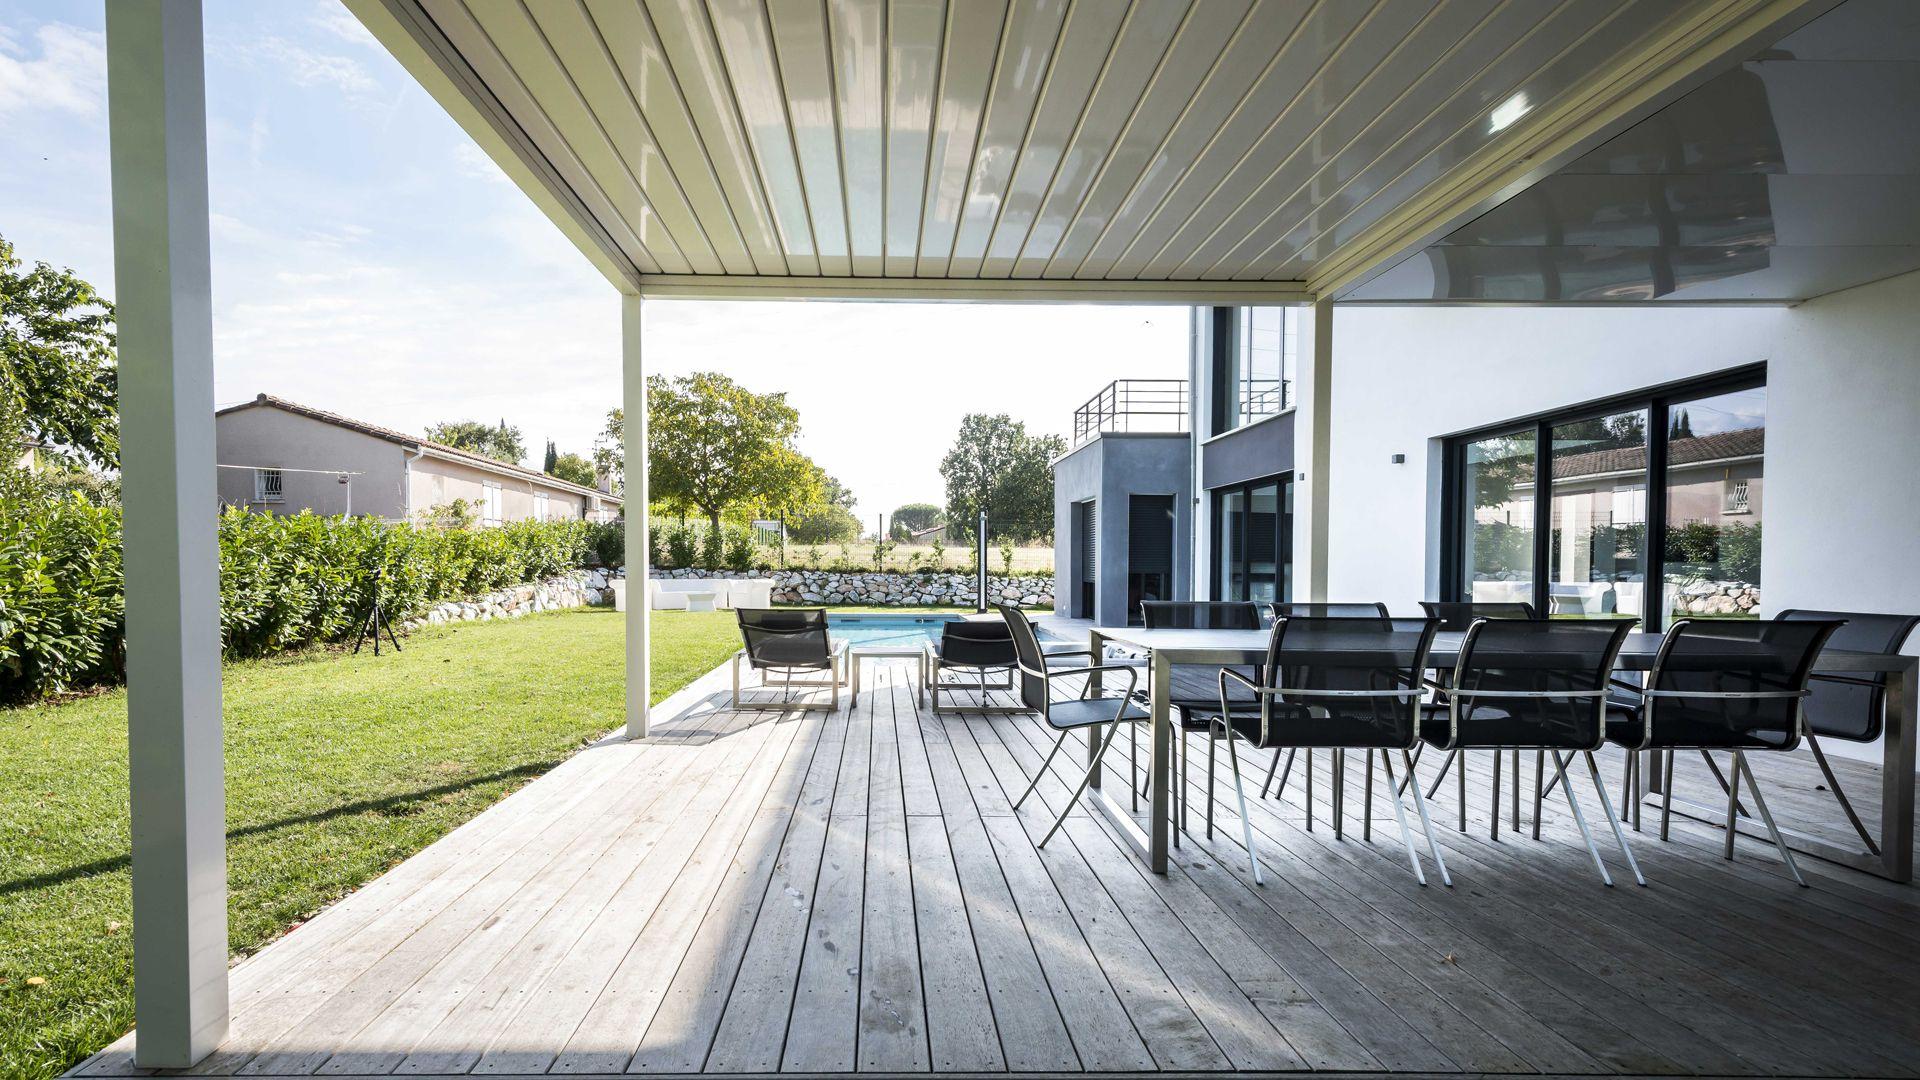 Seuil-architecture-maison-bioclimatique-Balma-Terrasse-slid-compressor